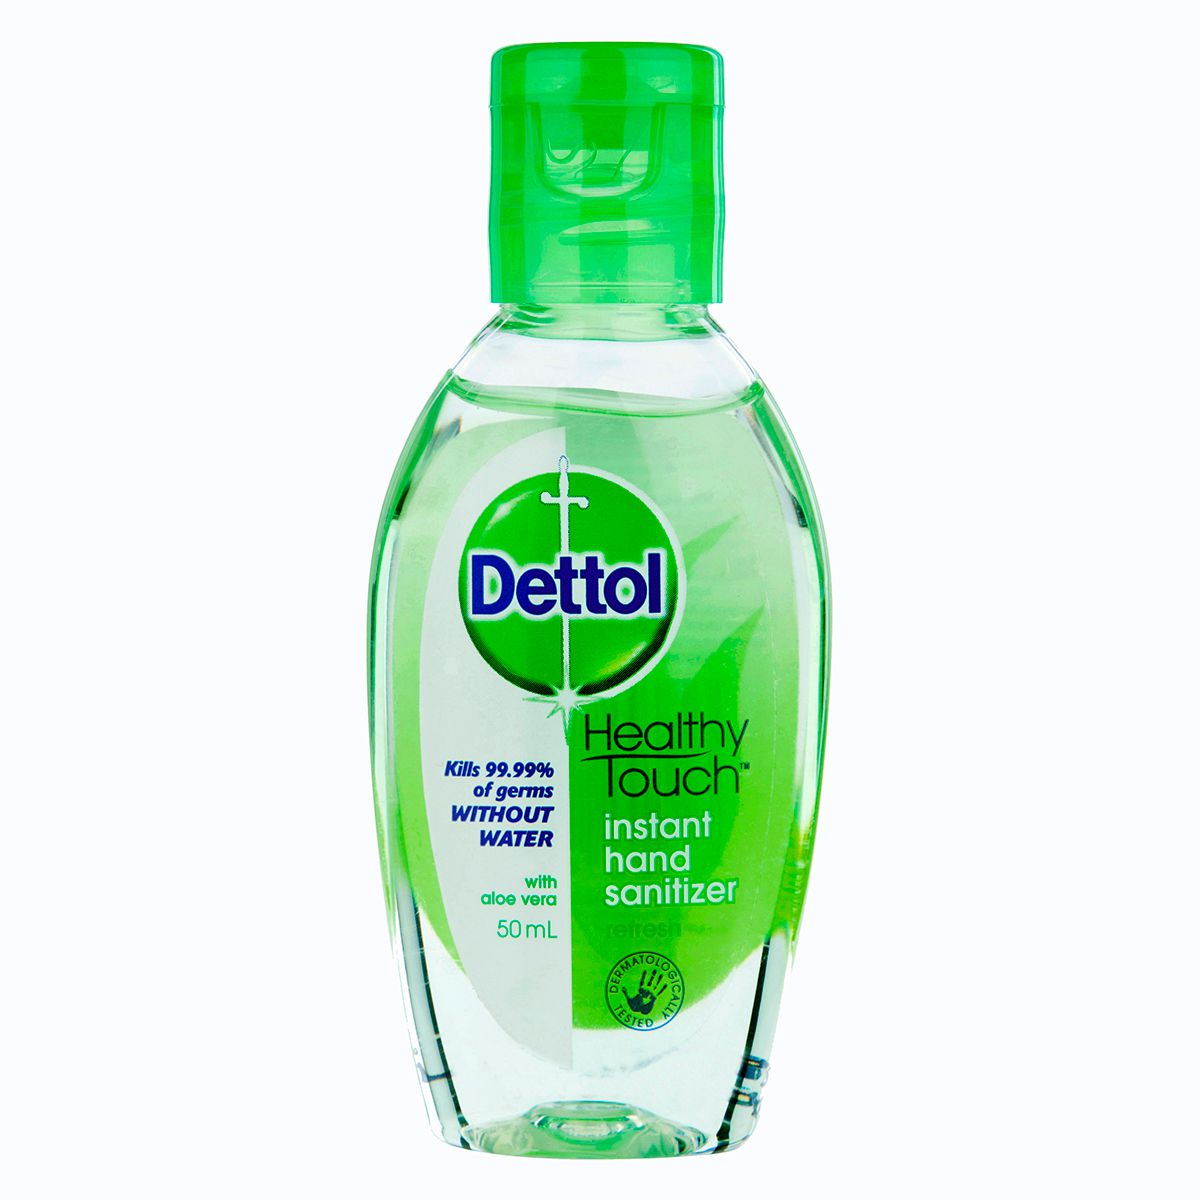 Dettol Instant Hand Sanitizer Refresh 50ml